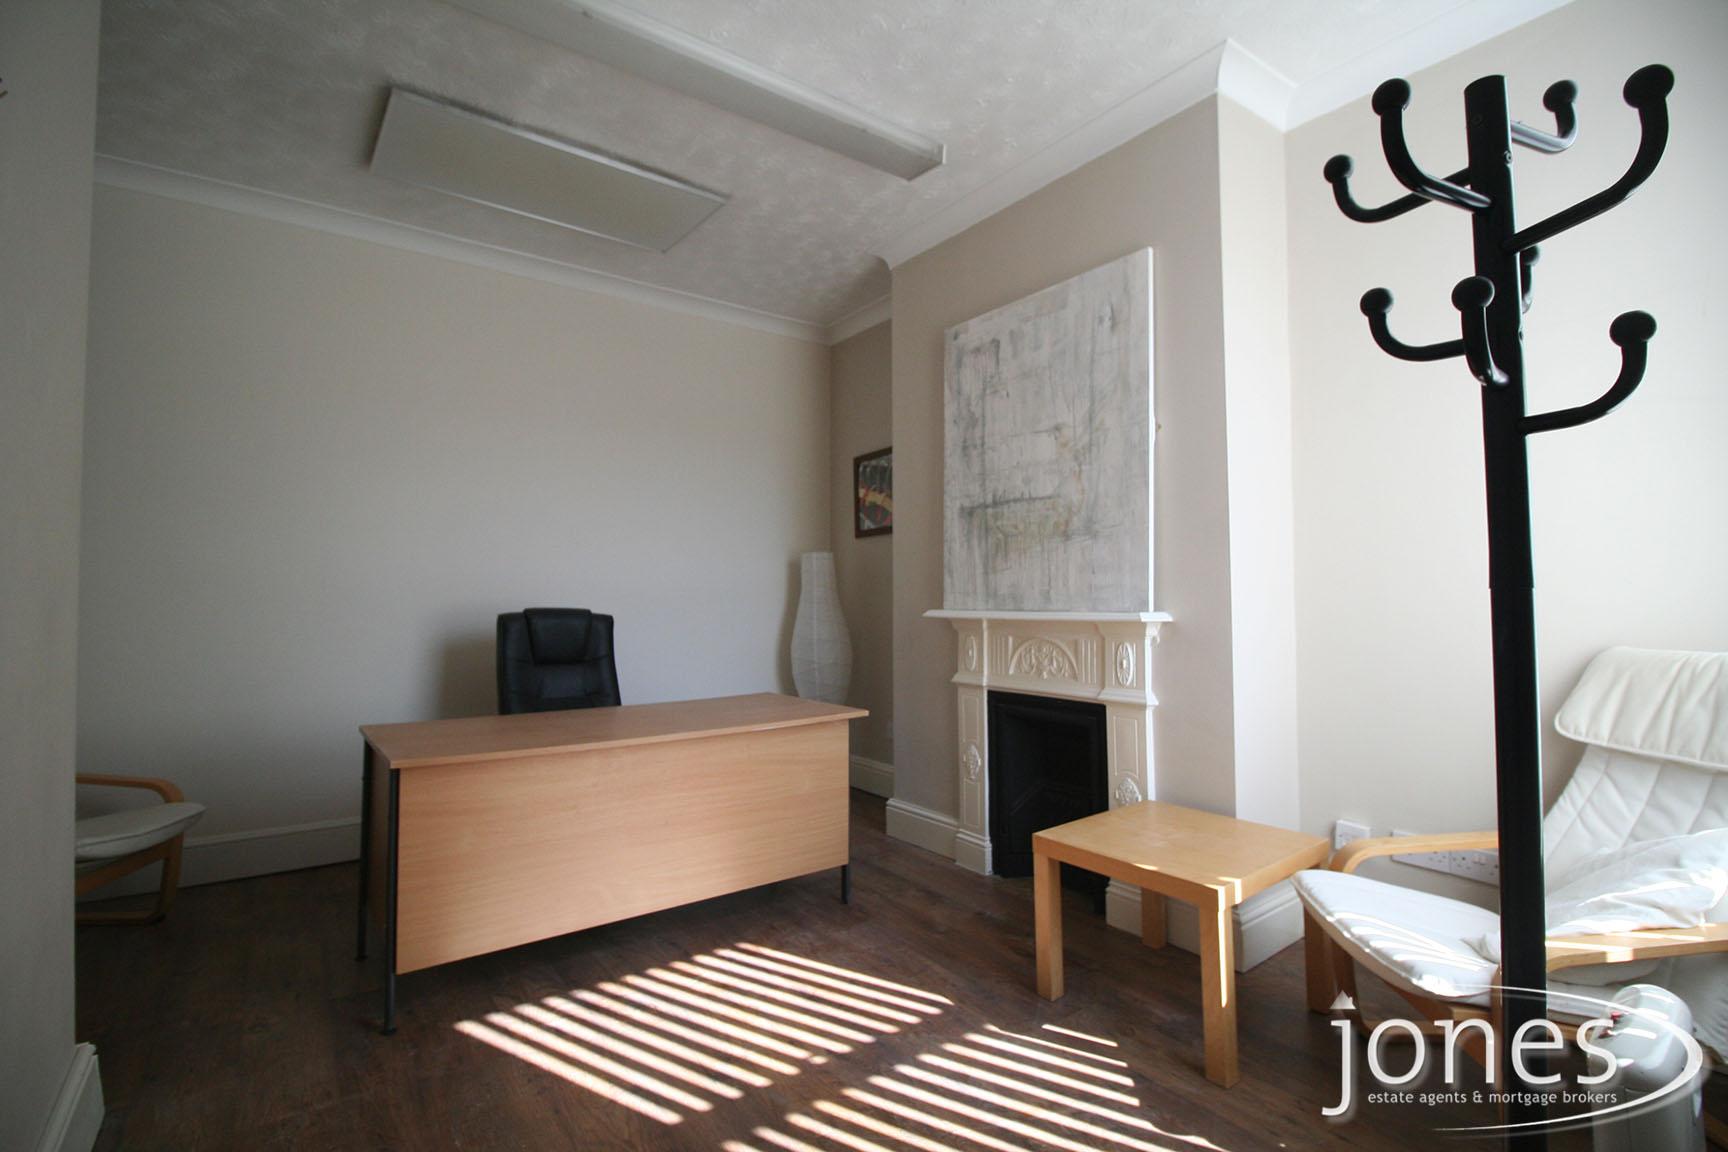 Home for Sale Let - Photo 02 The Green (Suite 1), Billingham, TS23 1EU